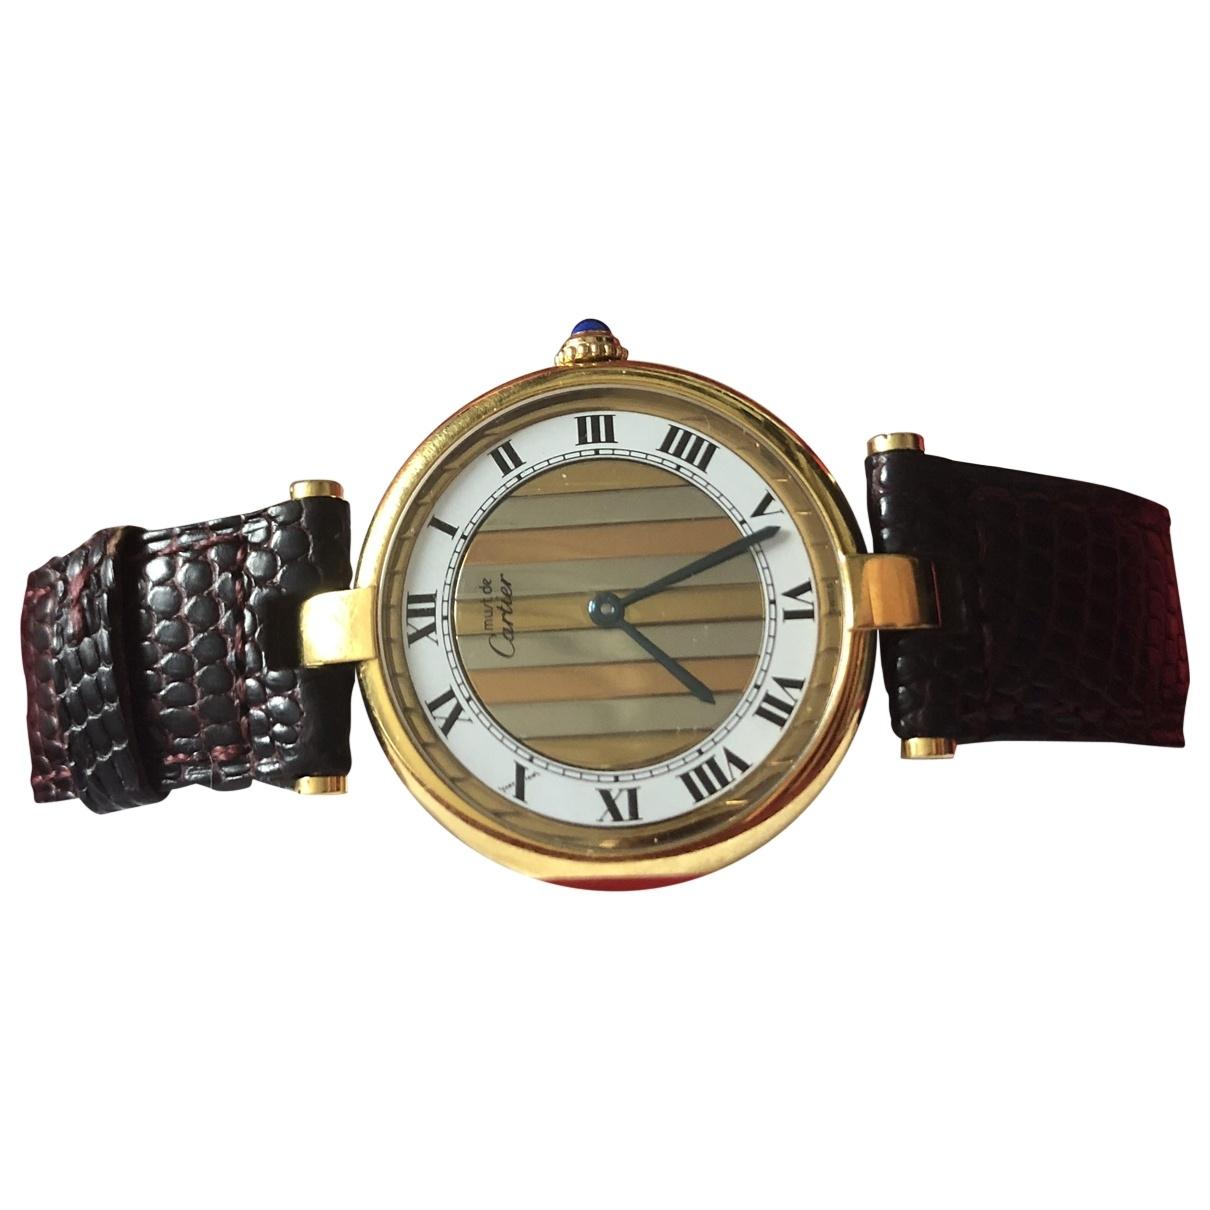 Reloj Must Trinity de Bermellon Cartier